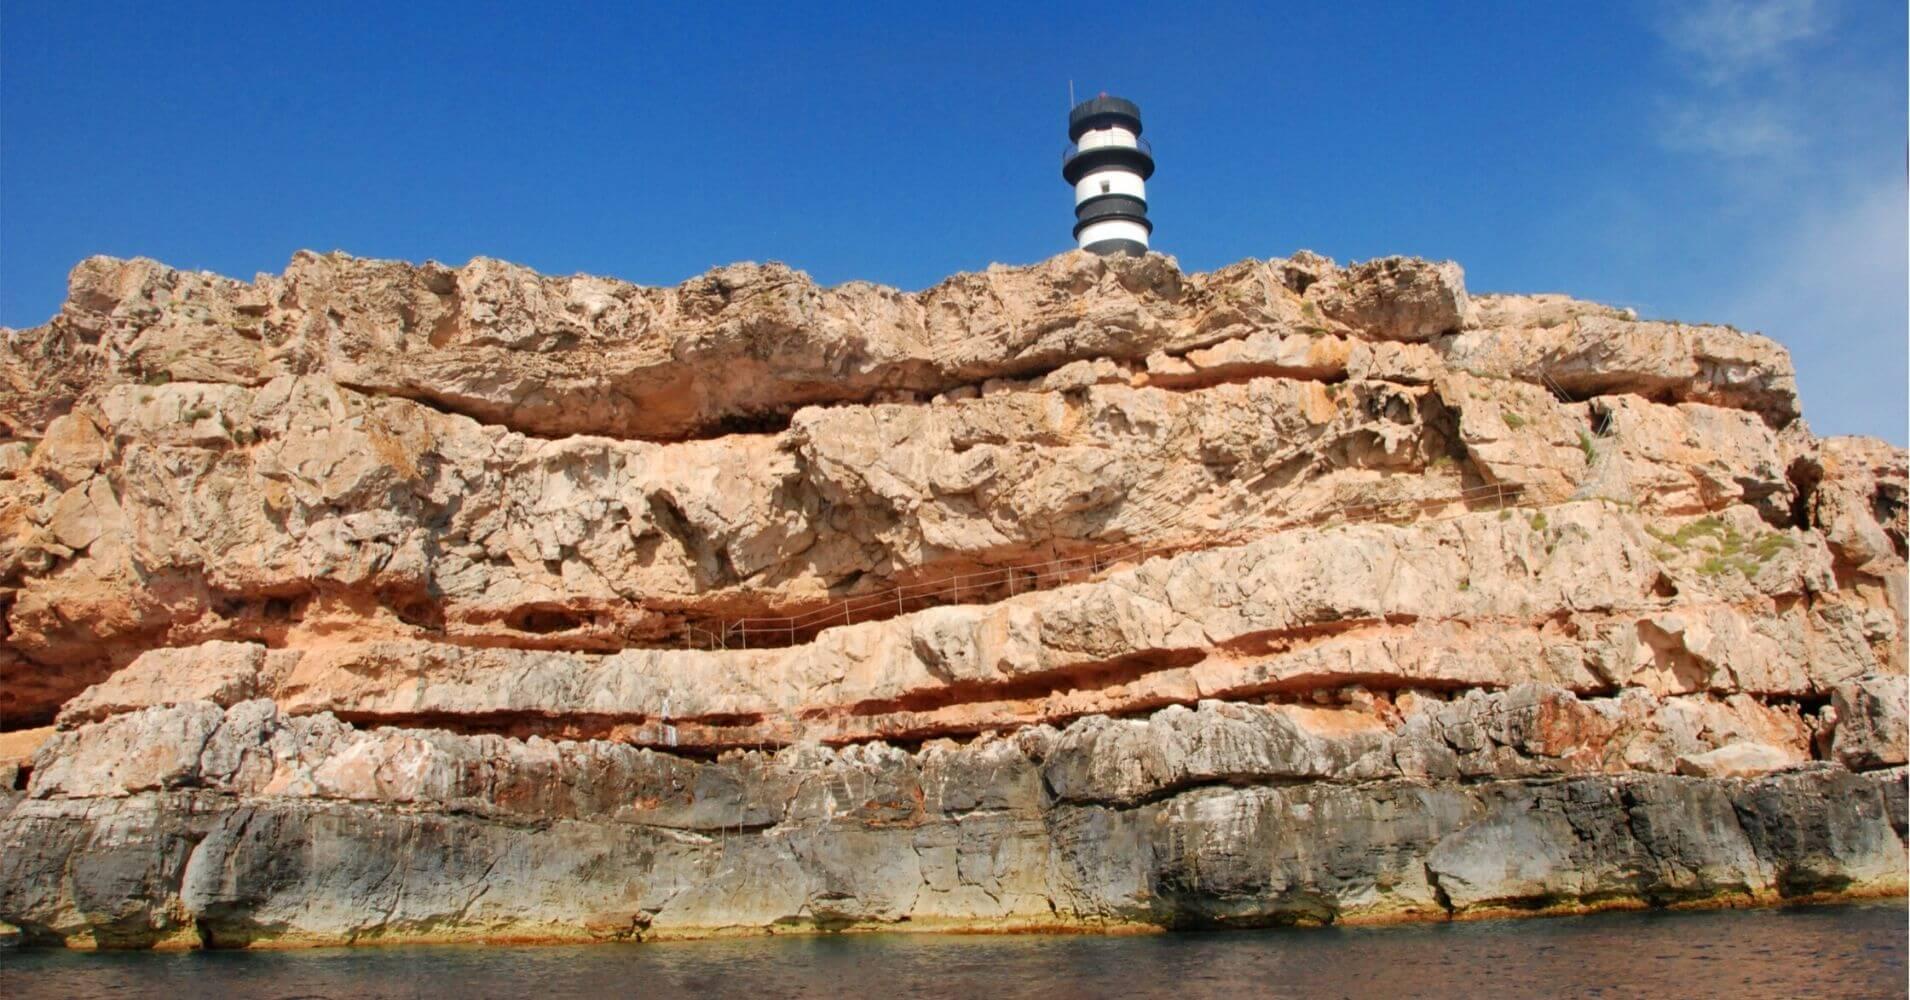 Faro Parque Nacional Marítimo Terrestre Archipiélago de Cabrera. Islas Baleares.